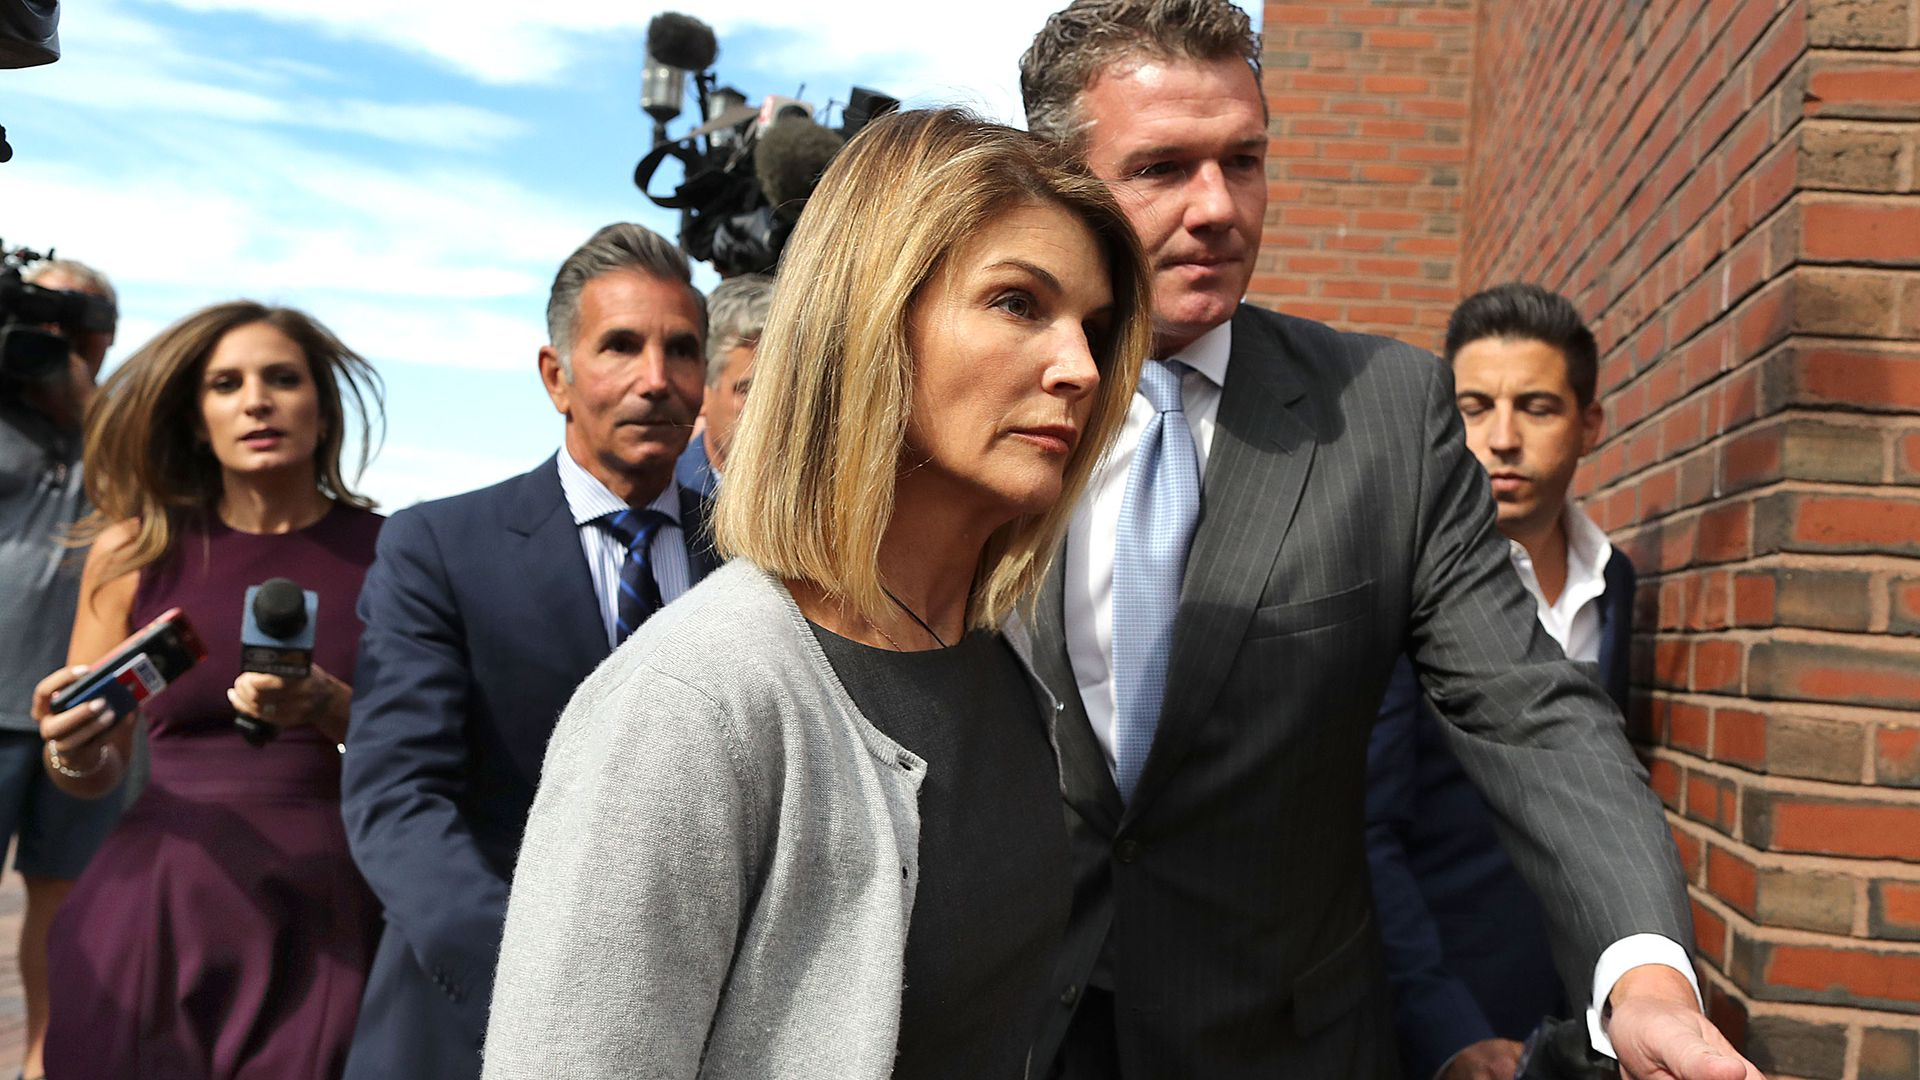 Lori Loughlin and husband sentenced in college bribery scandal - Axios